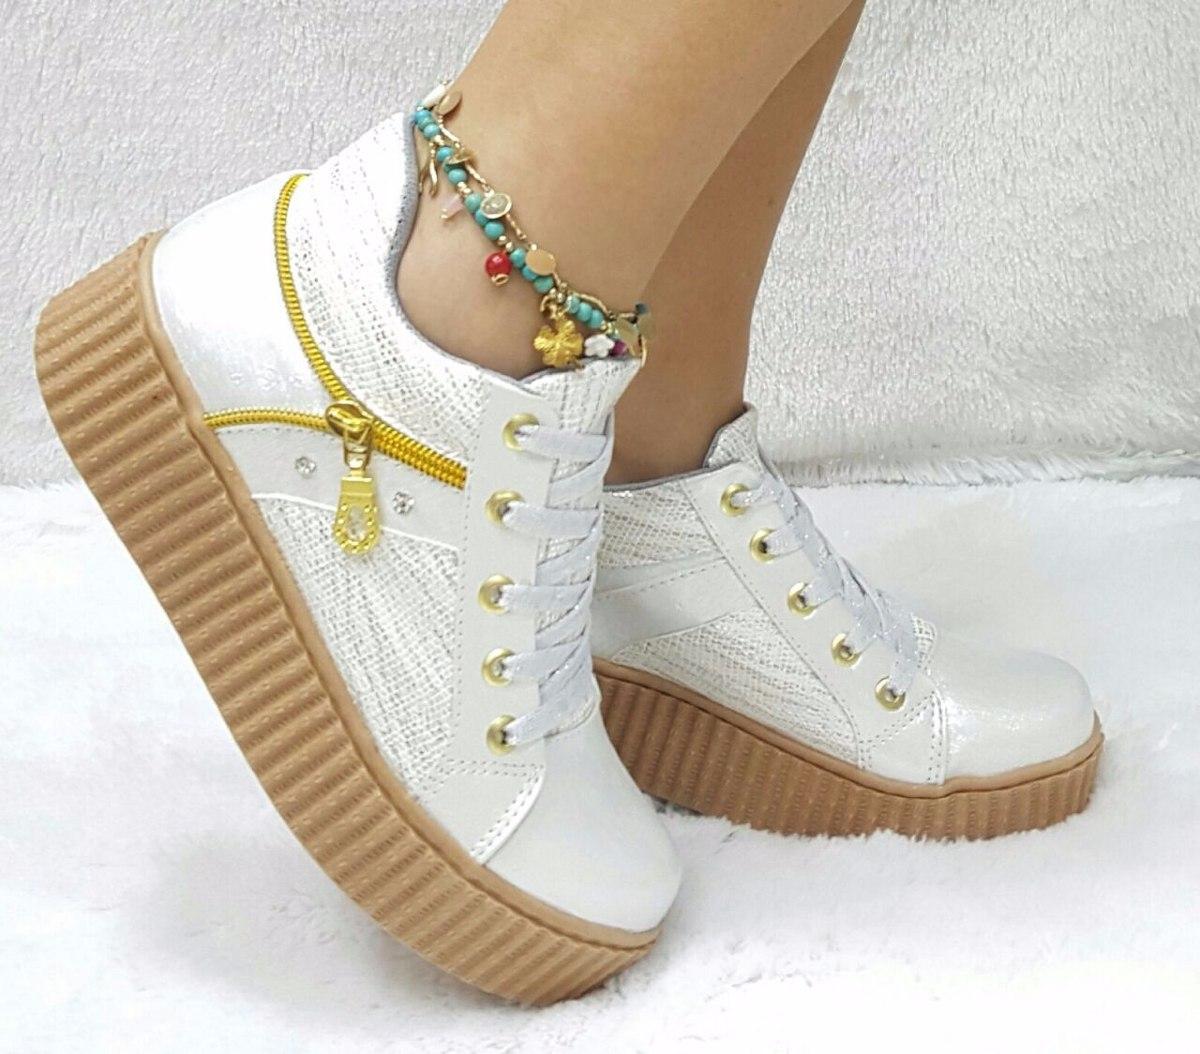 2aa328c1184bb zapato tenis deportivo mujer beis beige hueso dorado de moda. Cargando zoom.